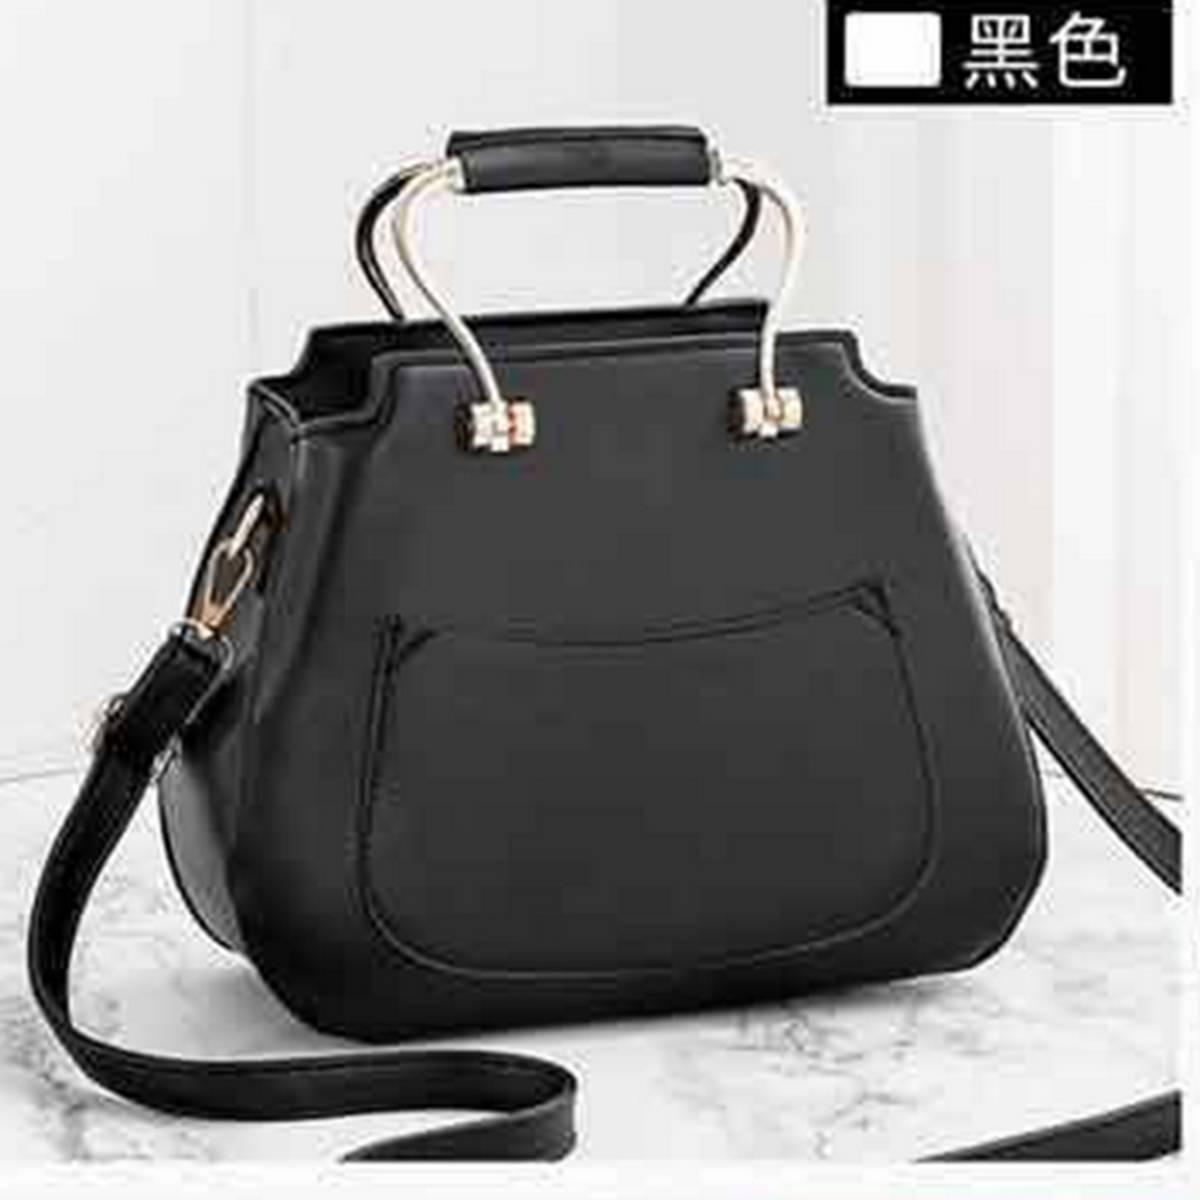 Women New Trendy & Stylish Hand/Shoulder Bag Fashionable 2020